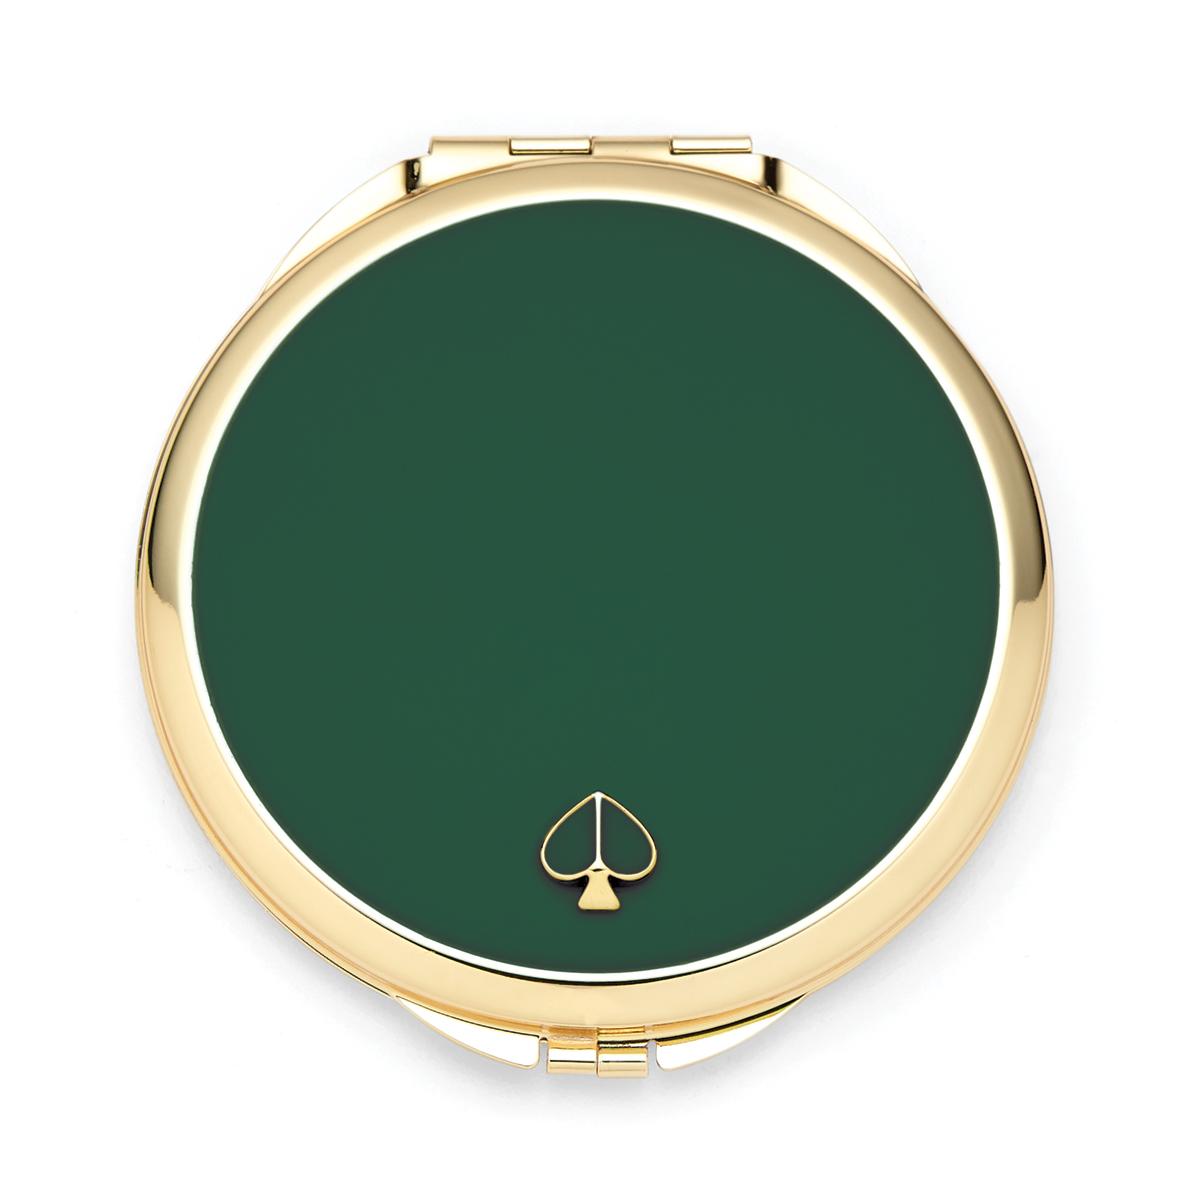 Kate Spade New York, Lenox Spade Street Gold Compact, Green